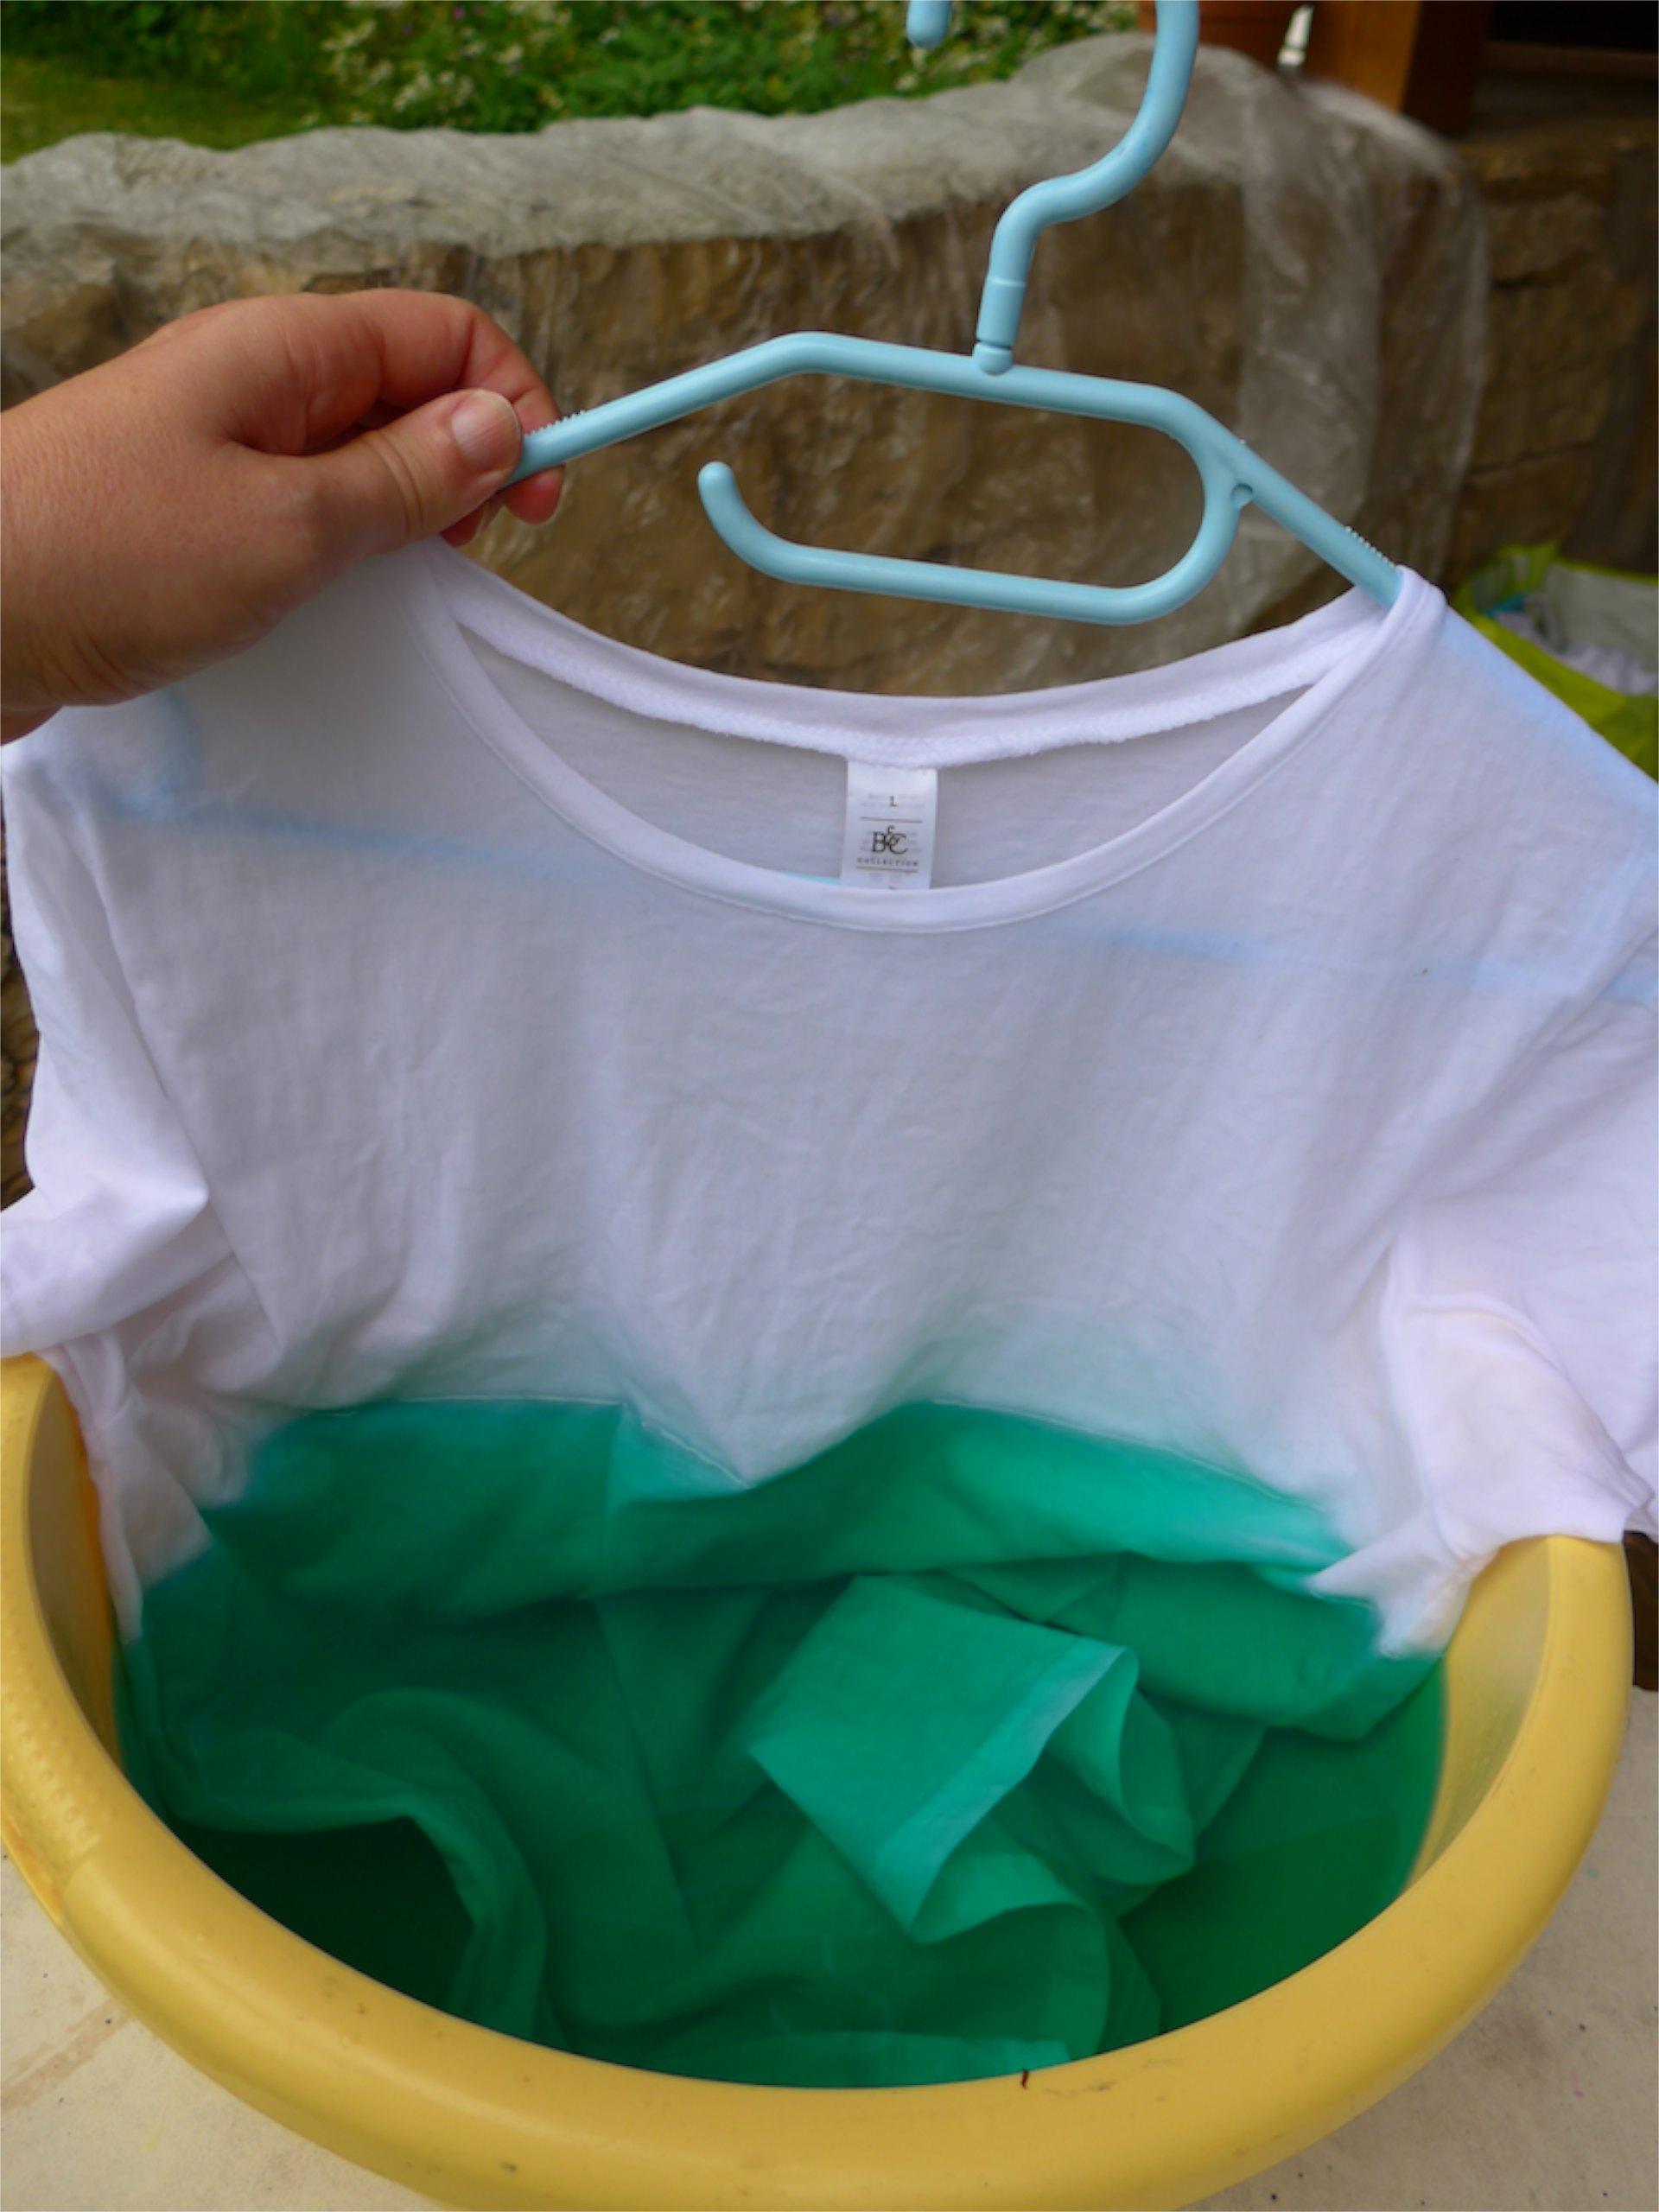 Teindre un tee-shirt en dégradé